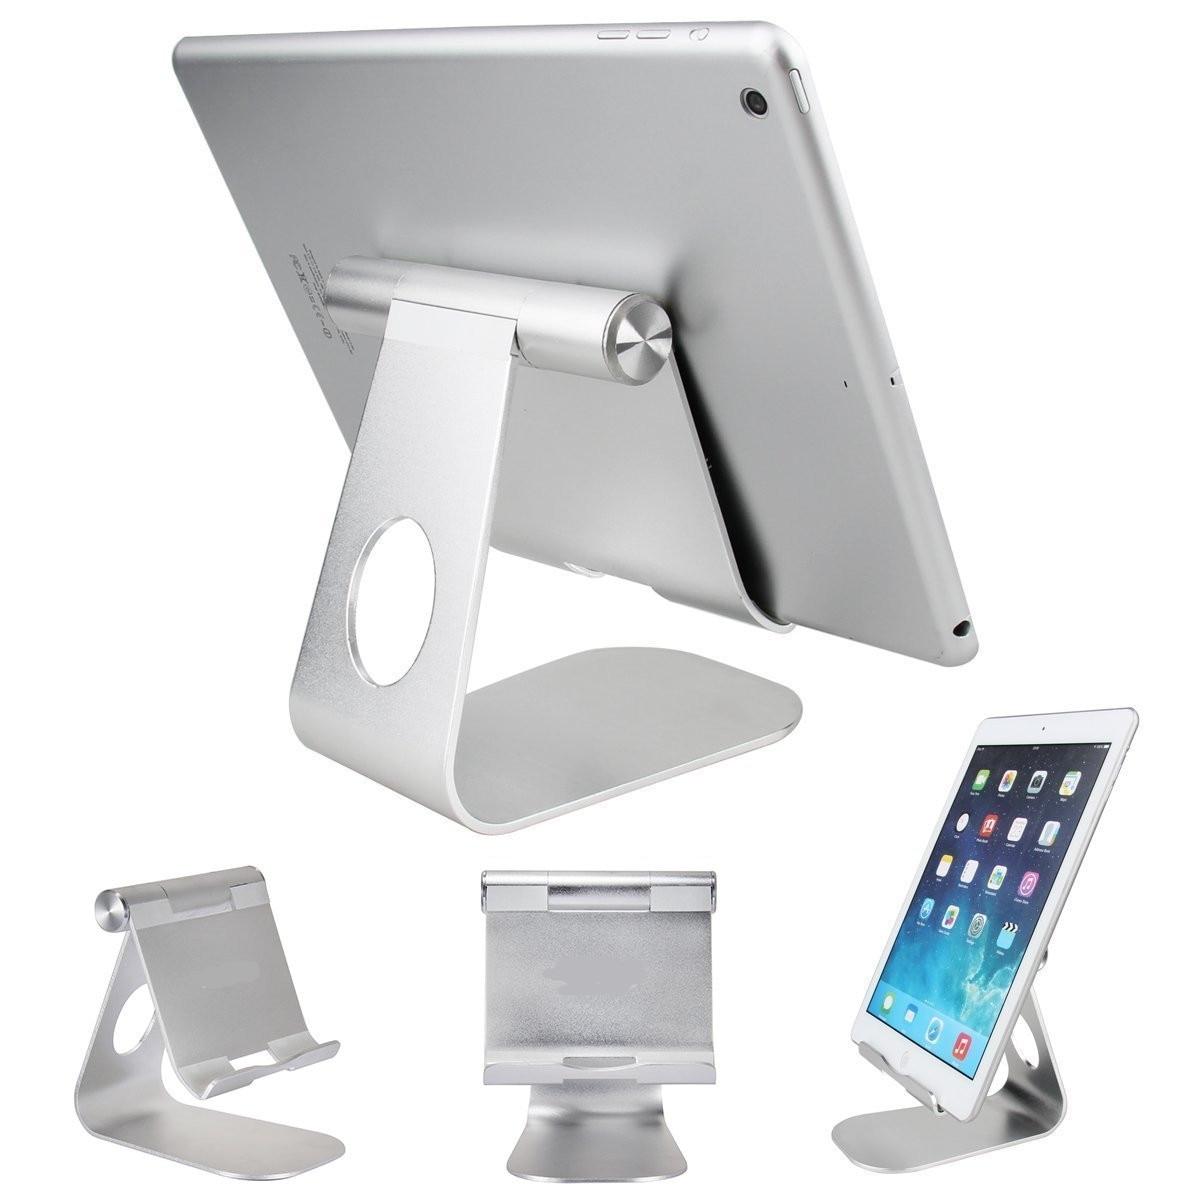 2017 Multi-Angle Portable Aluminum Tablet Stand Holder for iPad Pro mini Samsung Huawei T1 701u kindle E-readers Smartphones